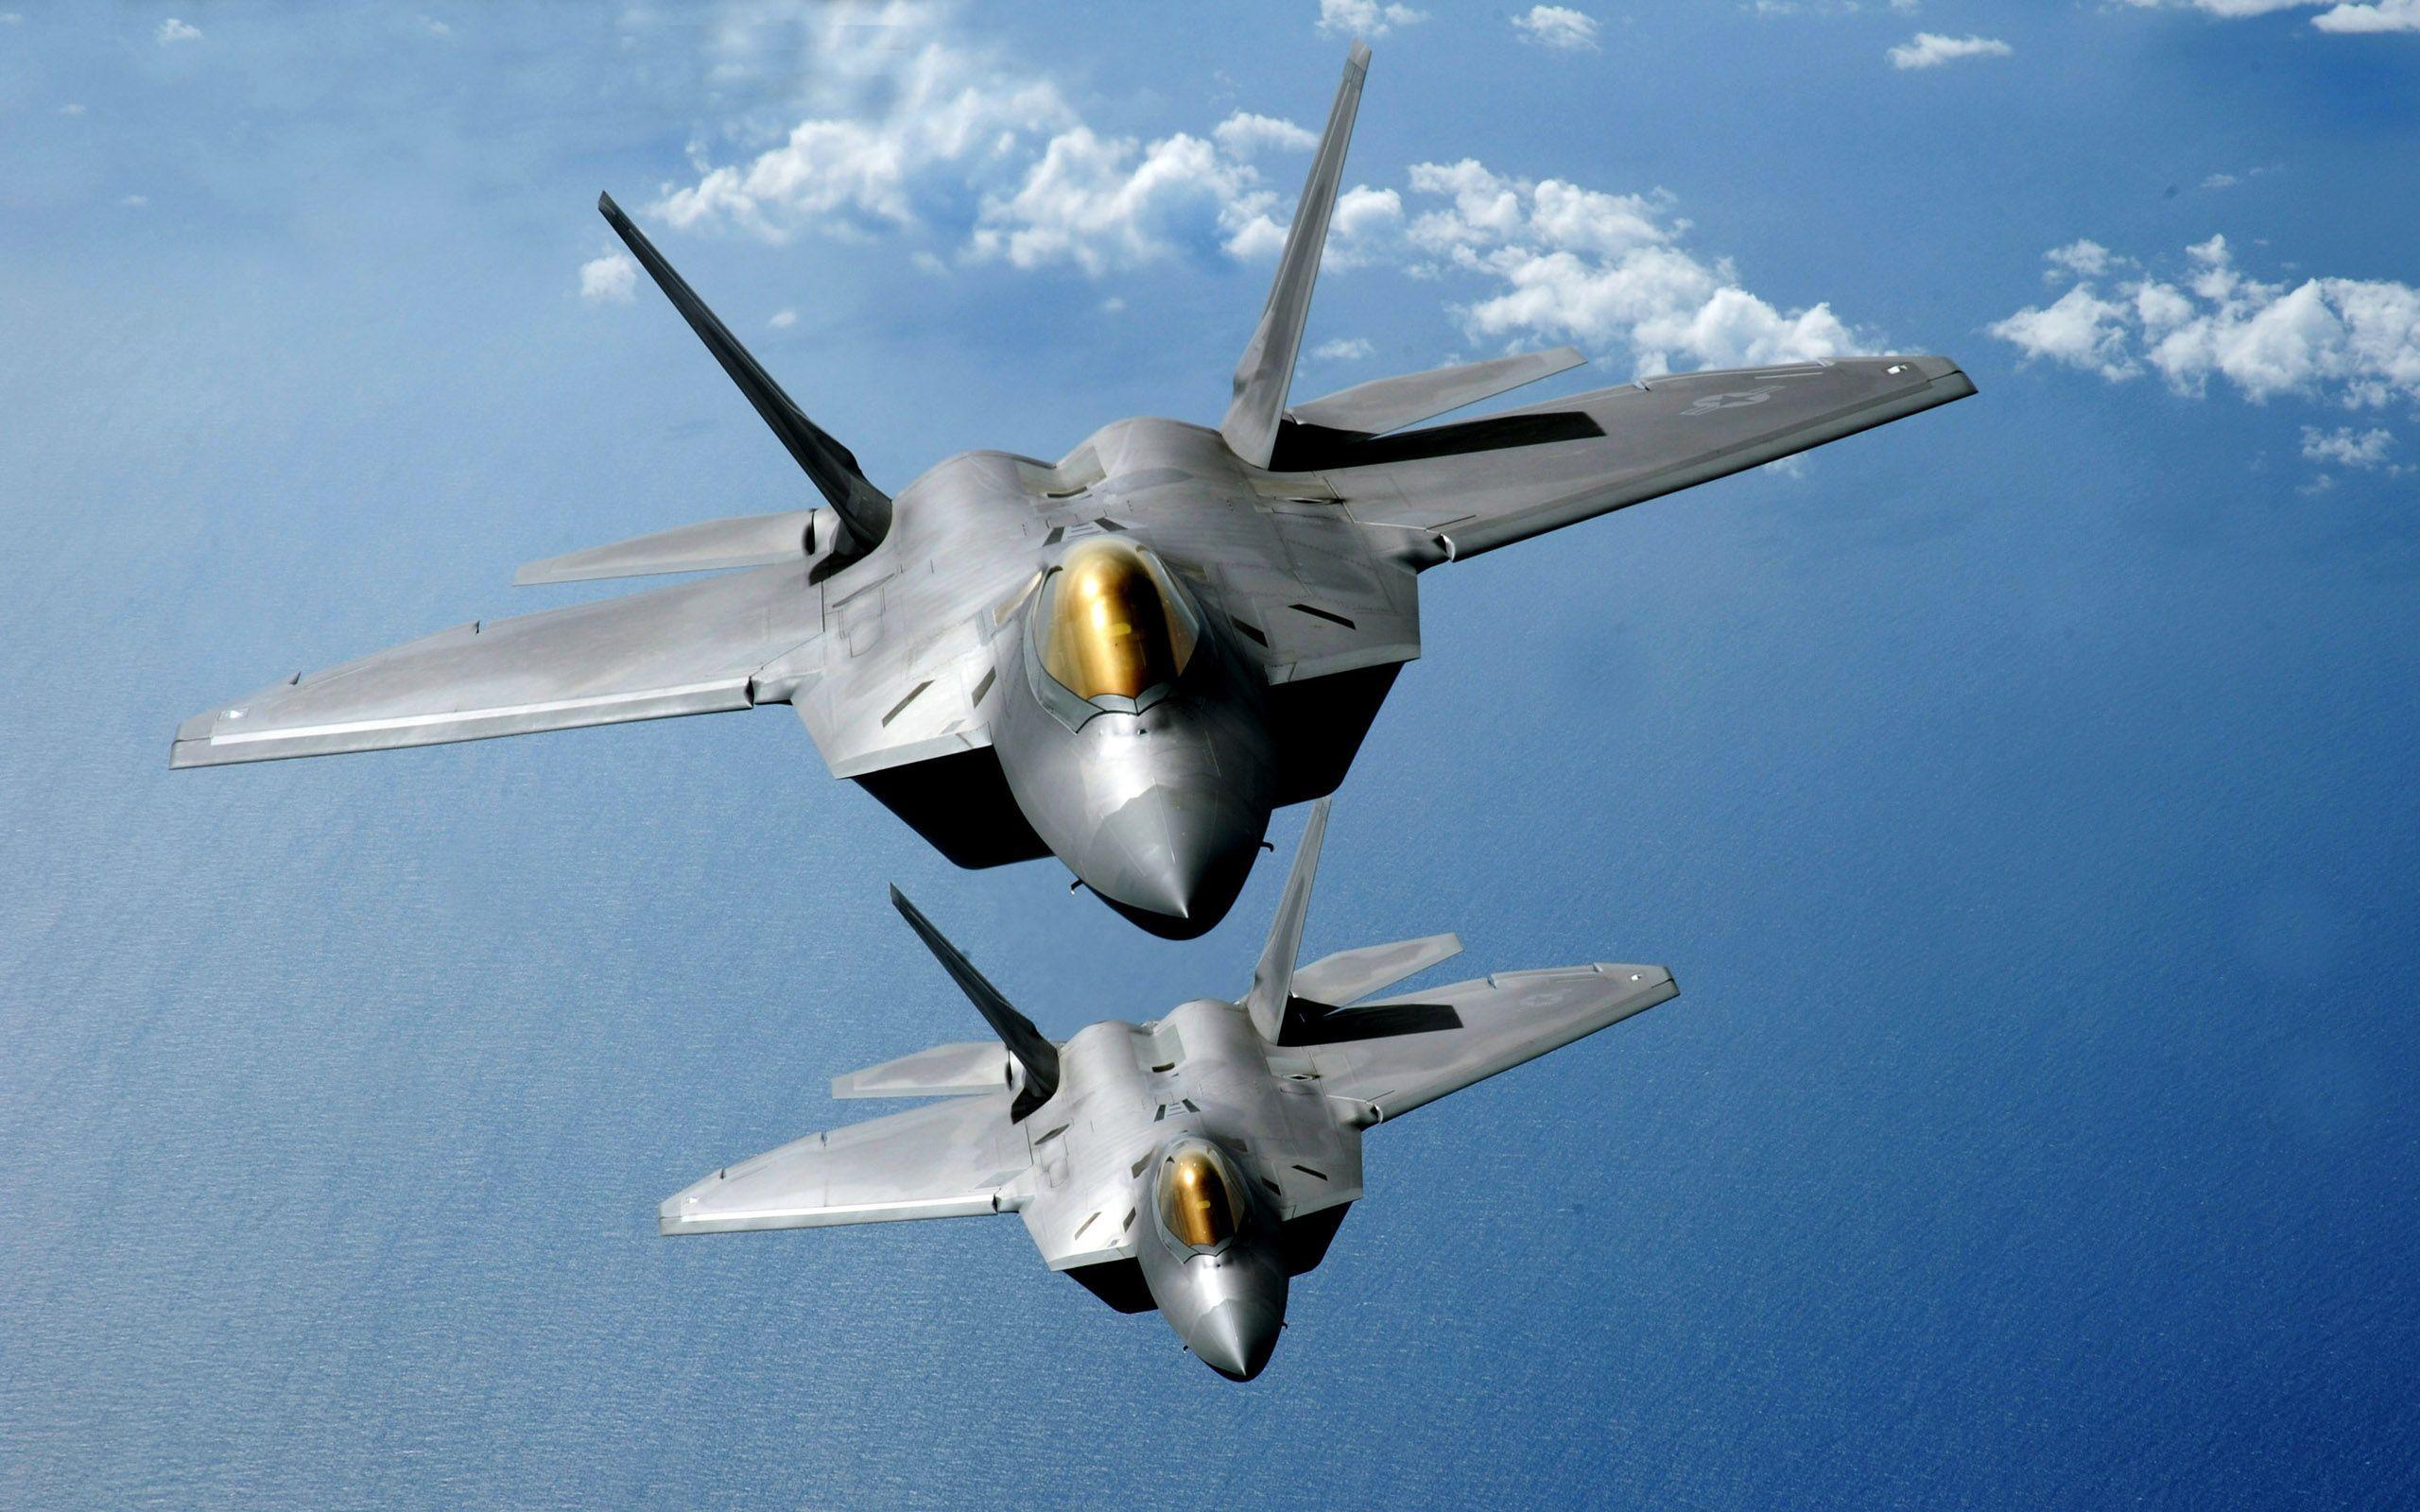 F 21 Raptor Wallpapers   Top Free F 21 Raptor Backgrounds ...